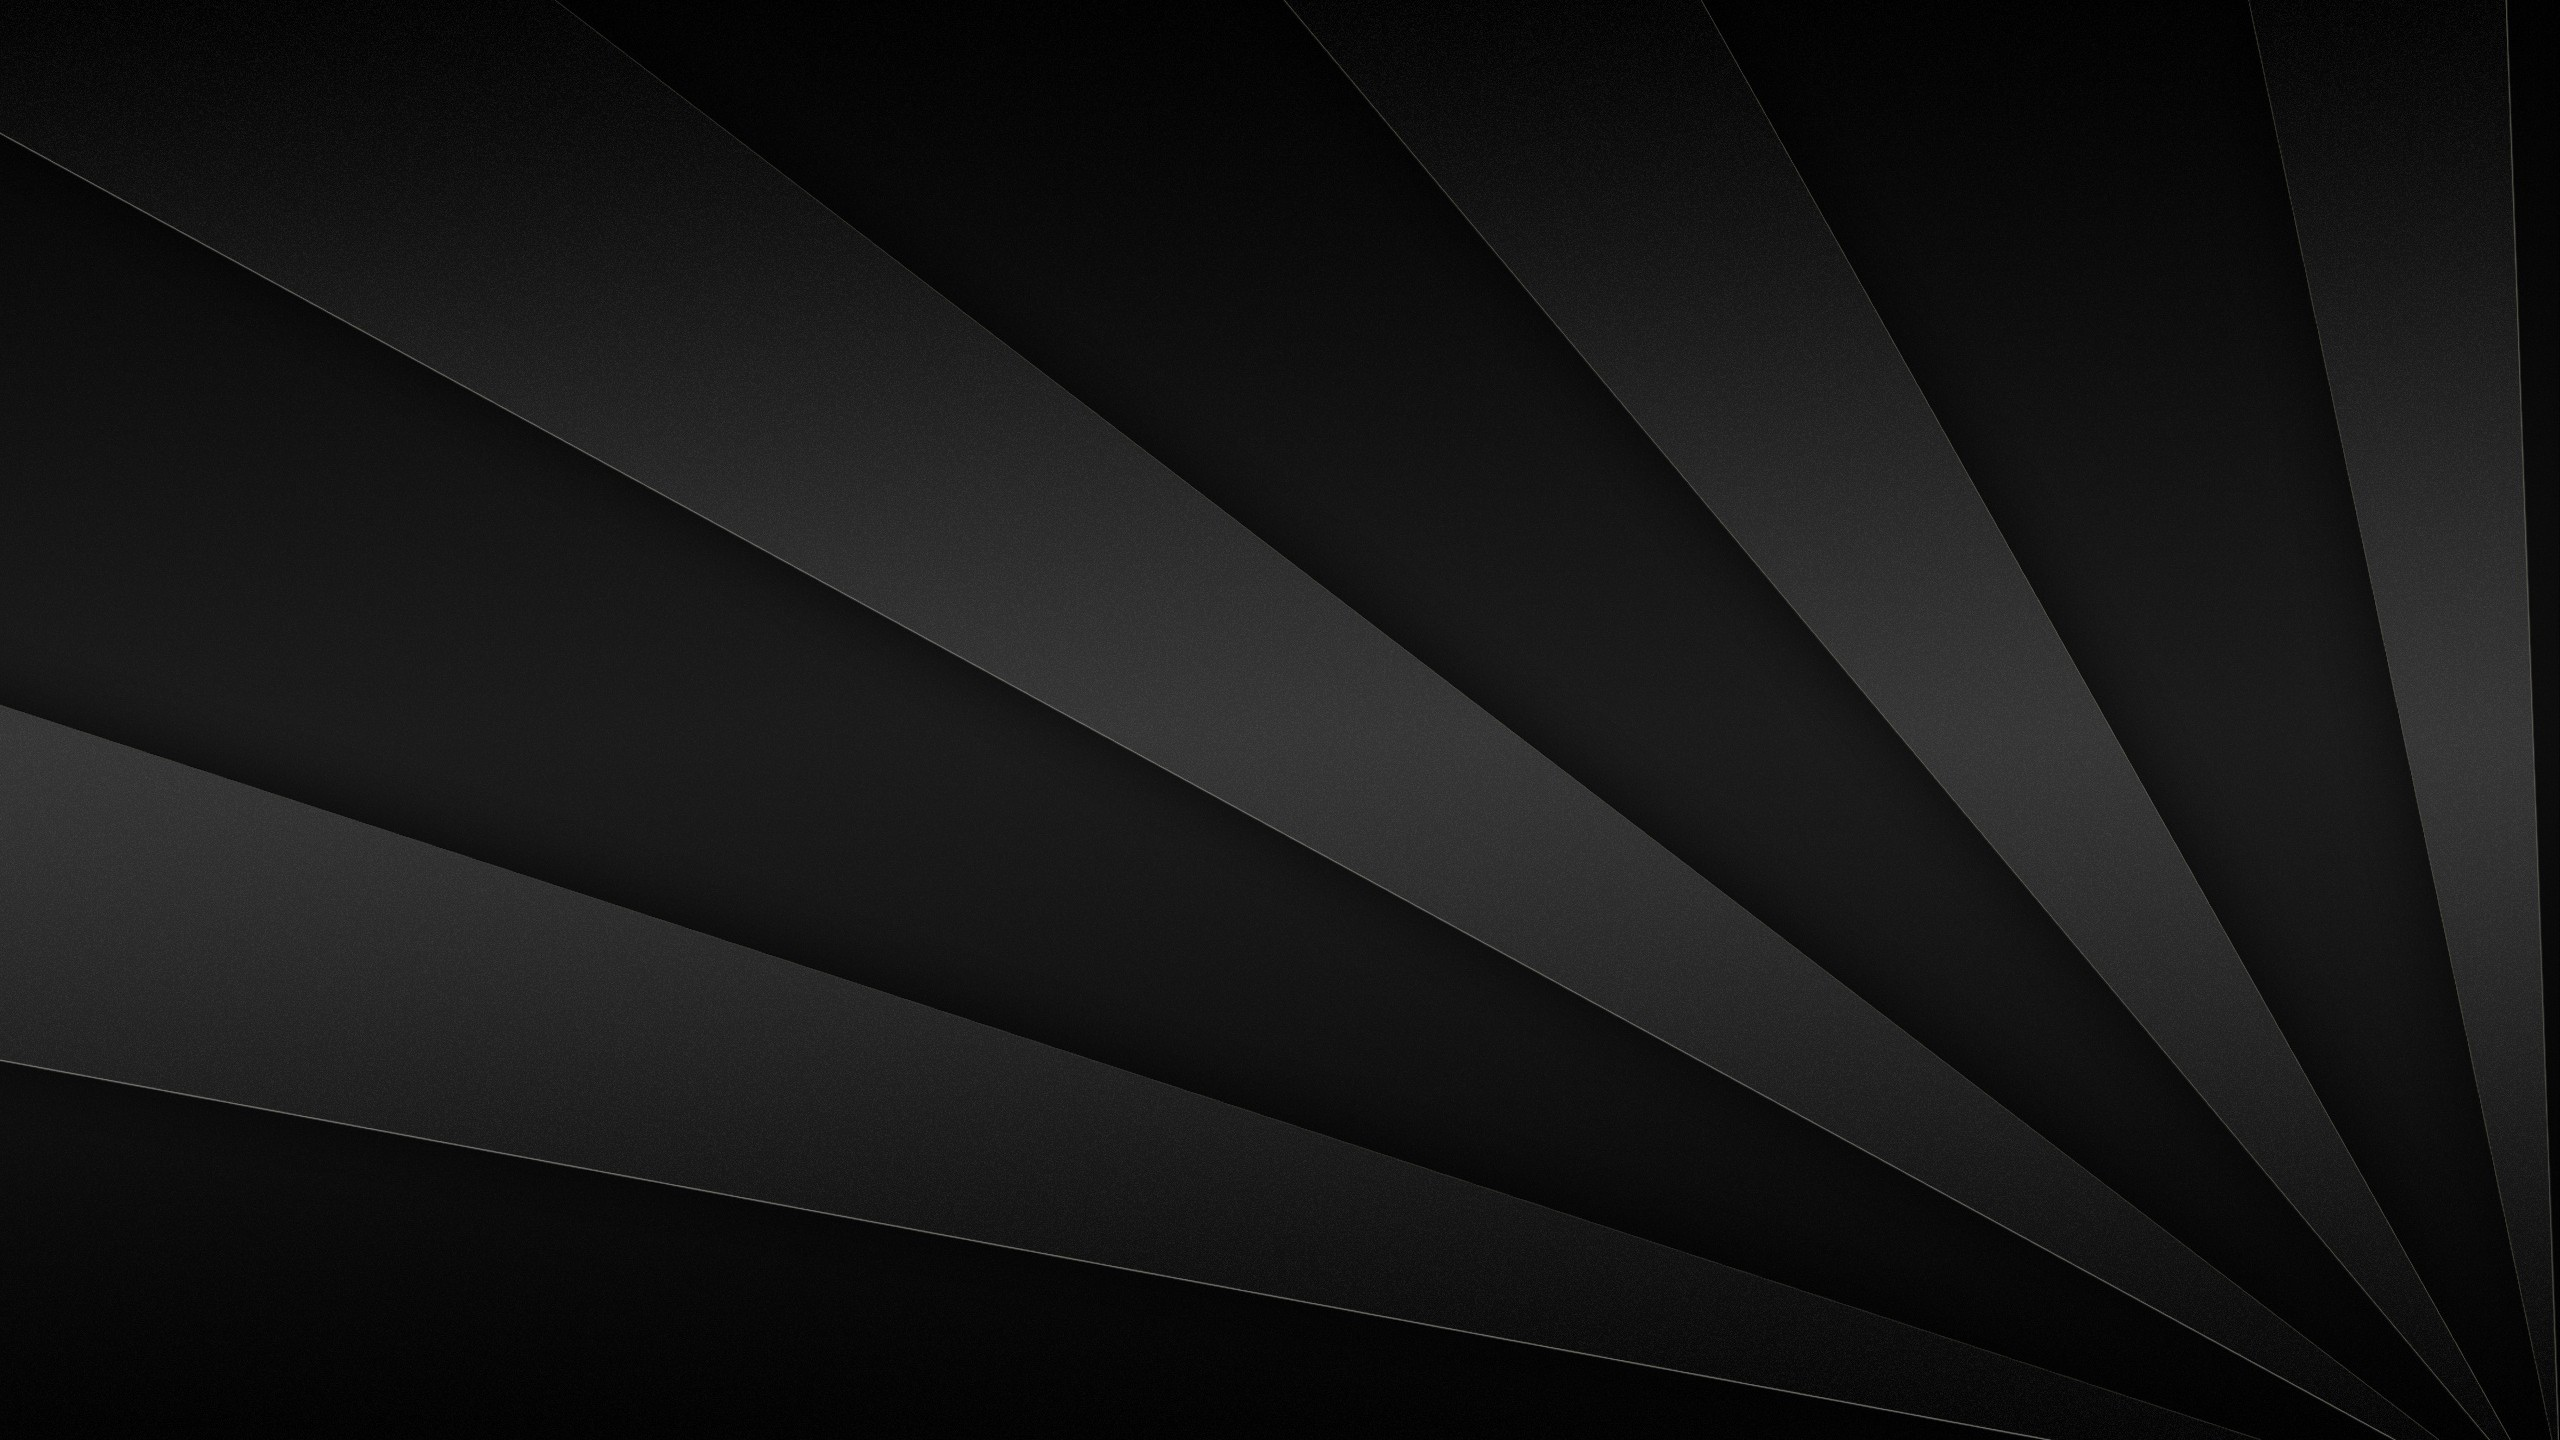 noir fond d 39 cran hd arri re plan 2560x1440 id 714080 wallpaper abyss. Black Bedroom Furniture Sets. Home Design Ideas